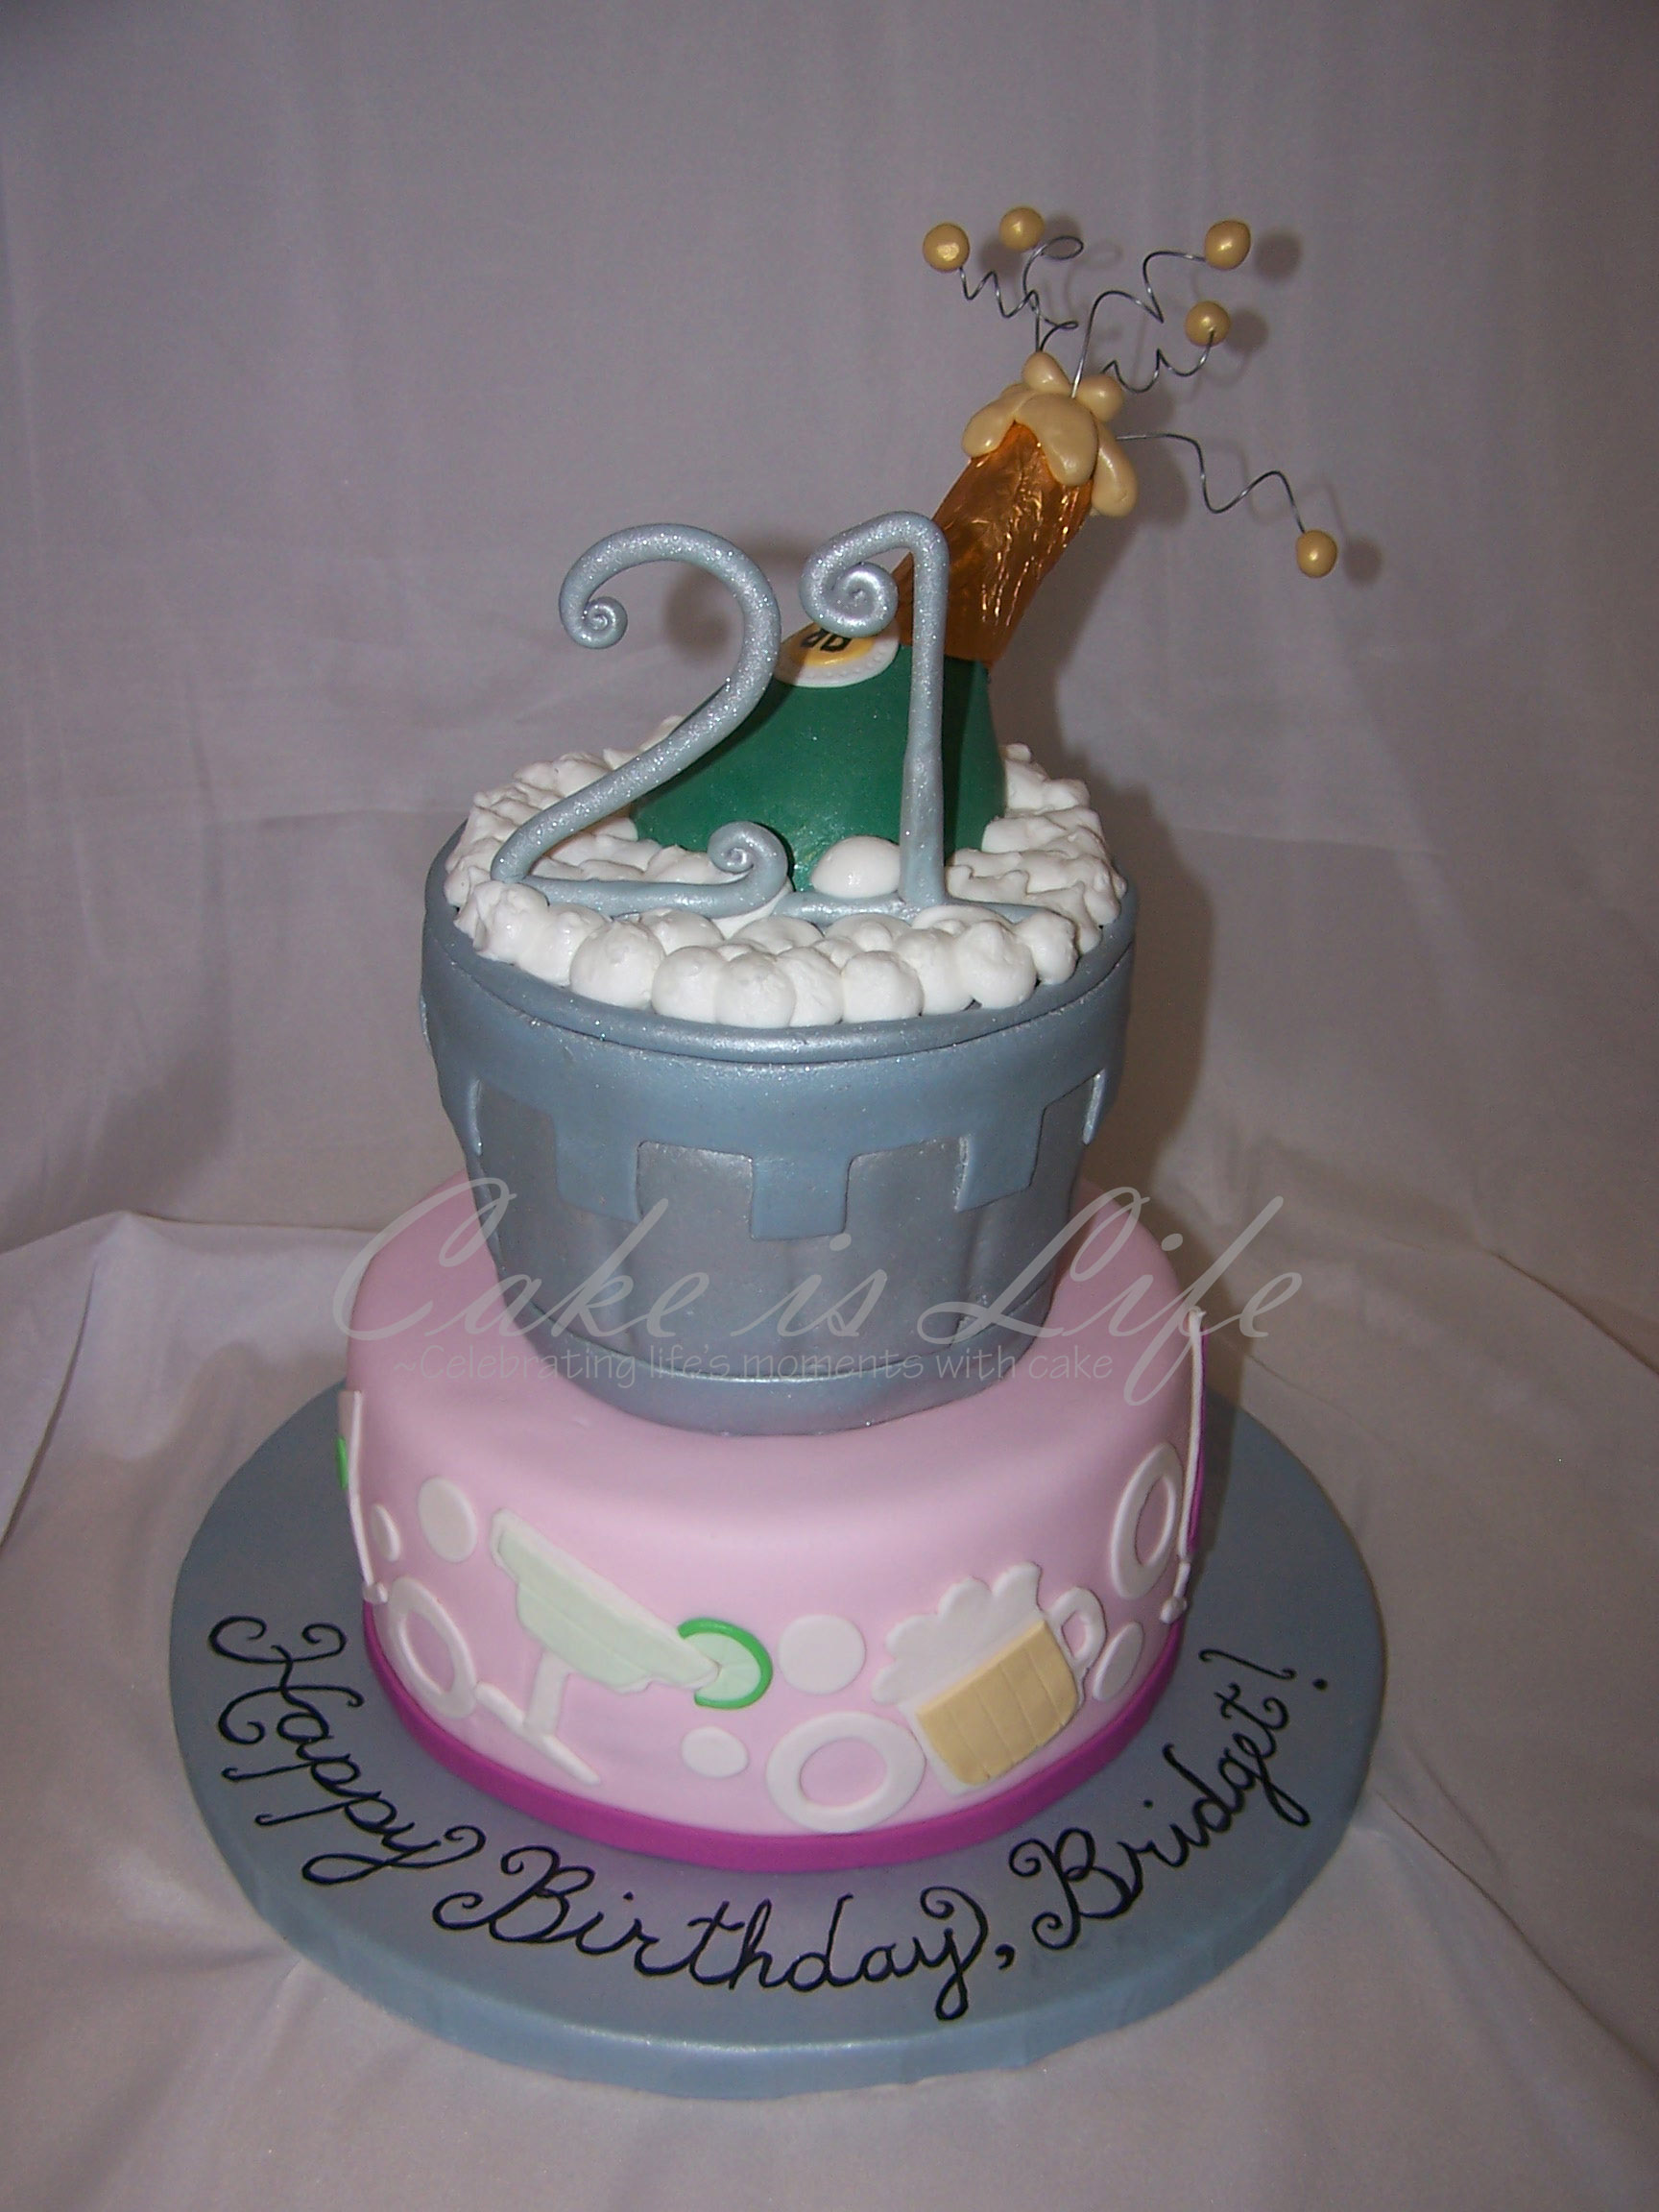 Birthday Cake Flavor Suggestions